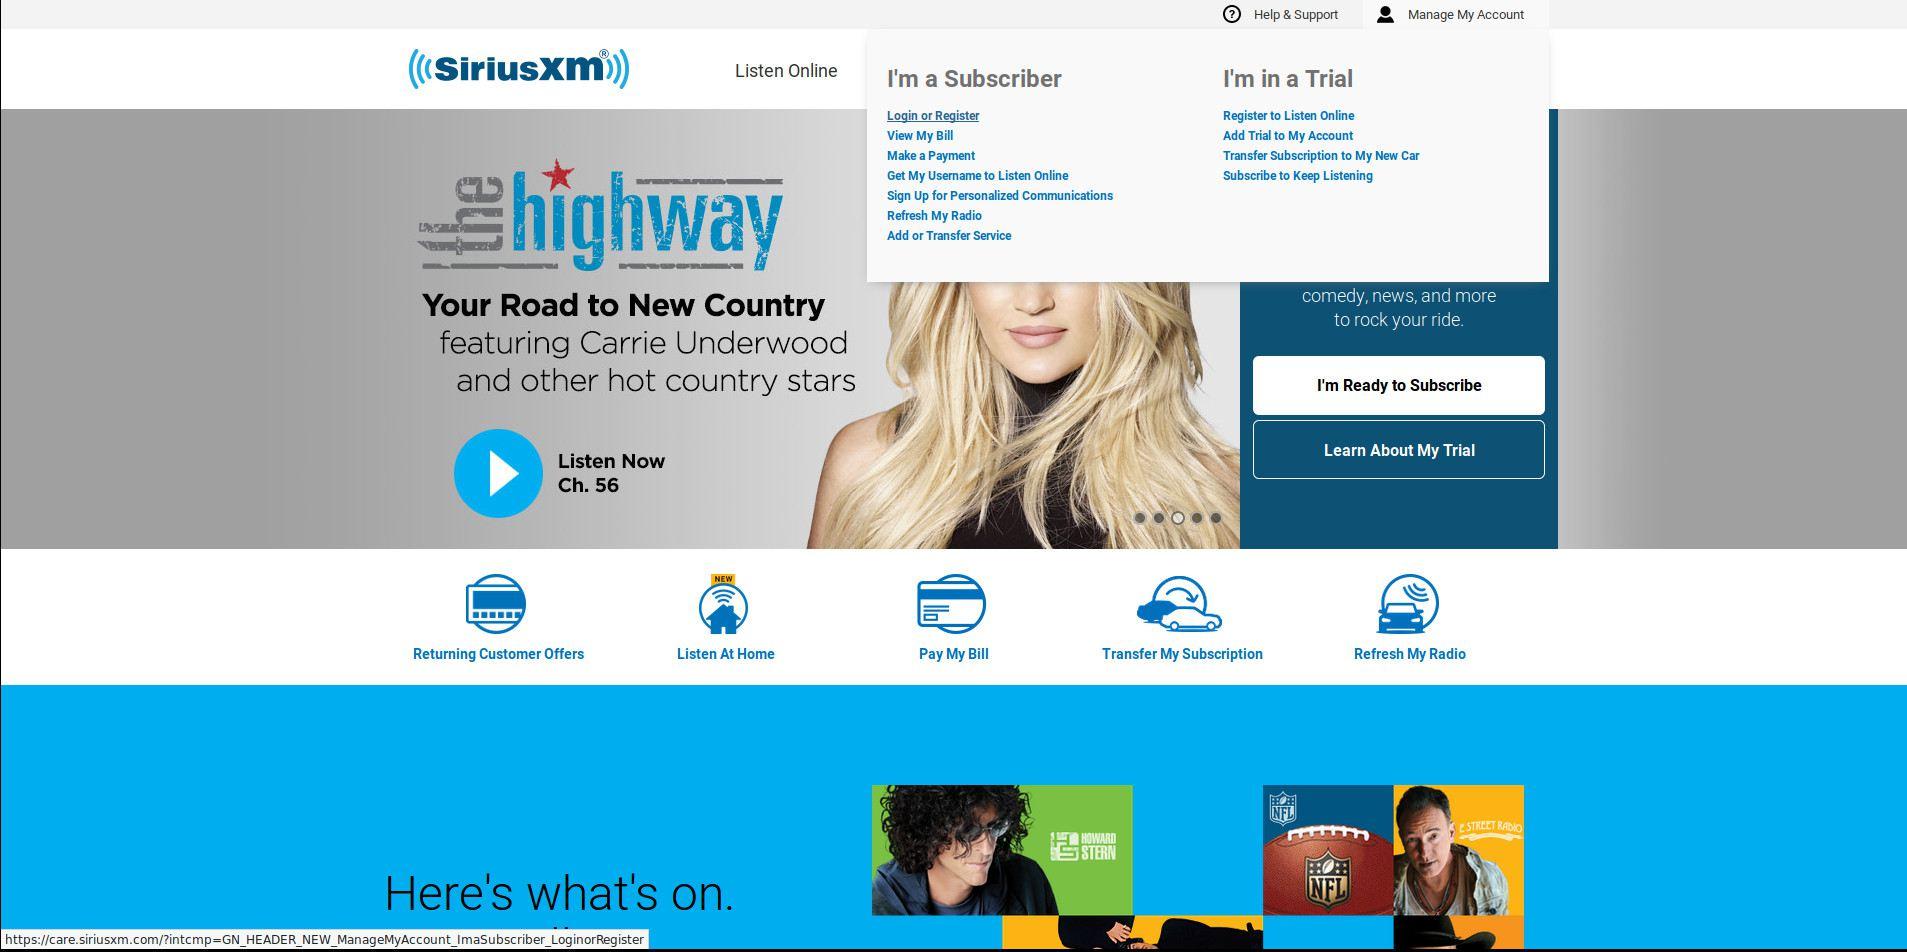 SiriusXM homepage.